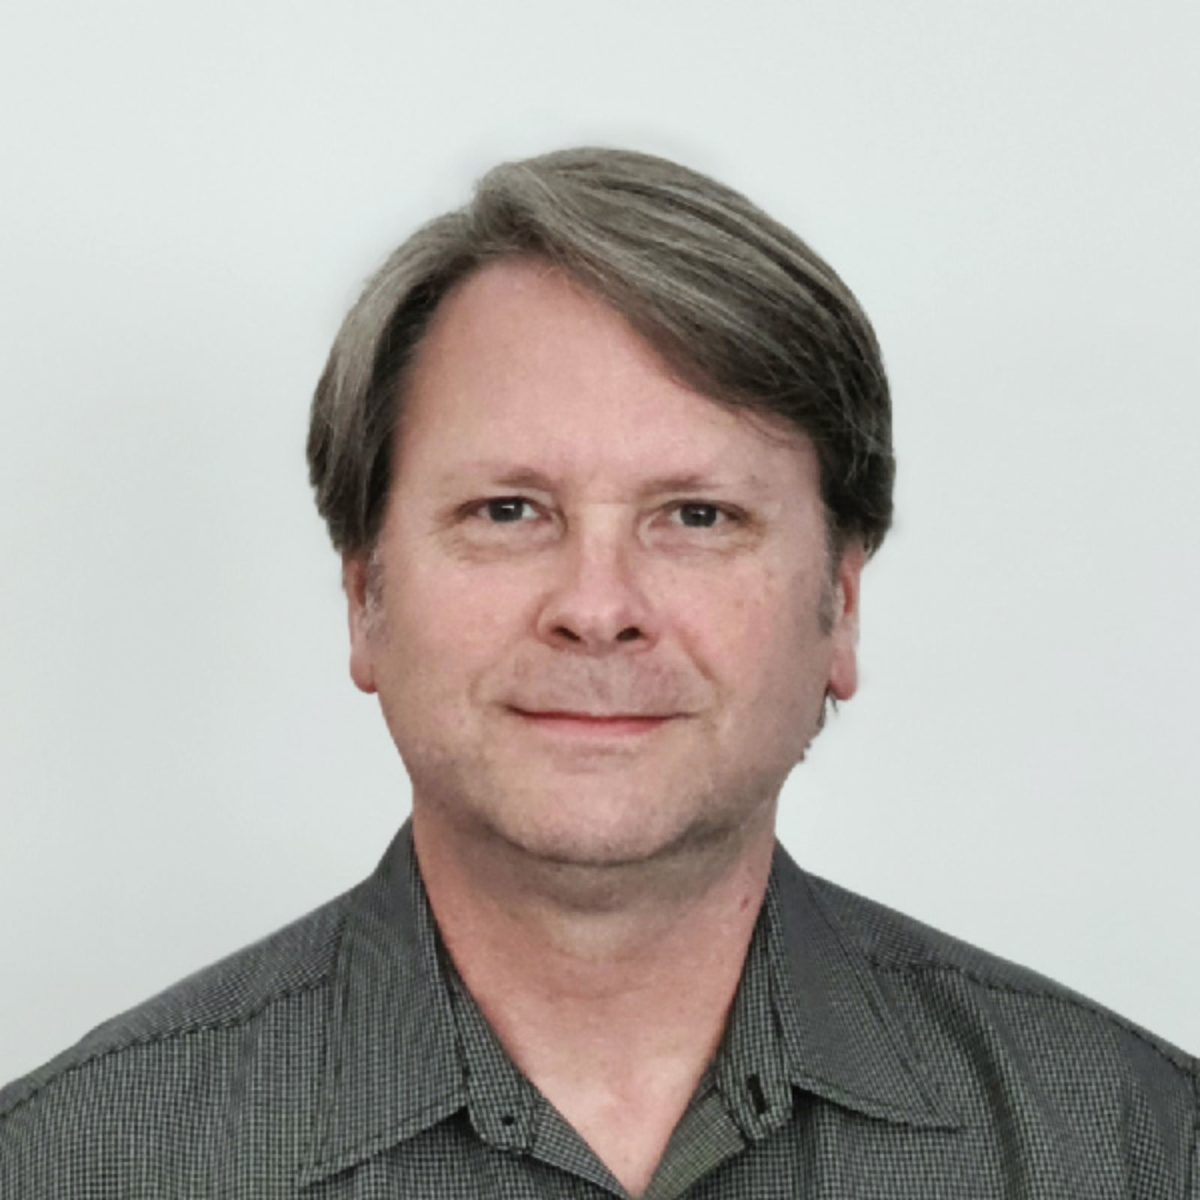 Tim Prentice – TVS design VP